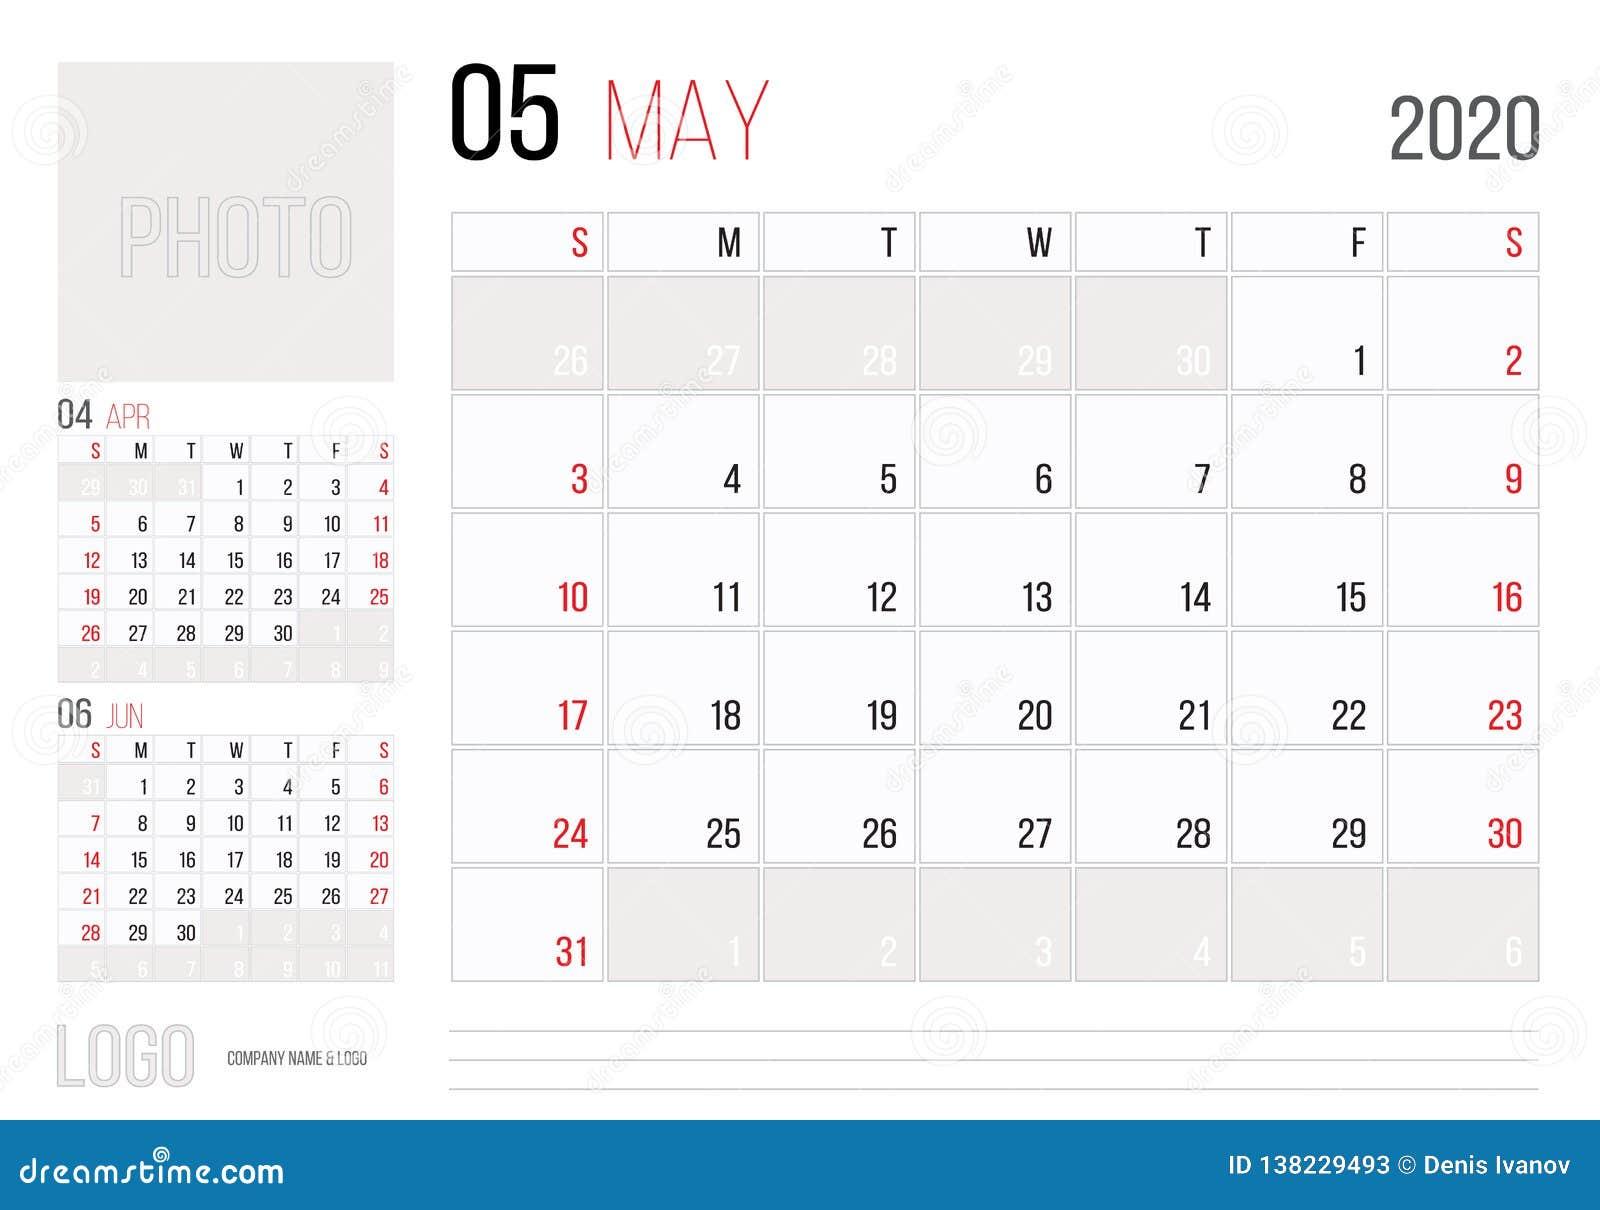 Calendar 2020 Planner Corporate Template Design May  Week